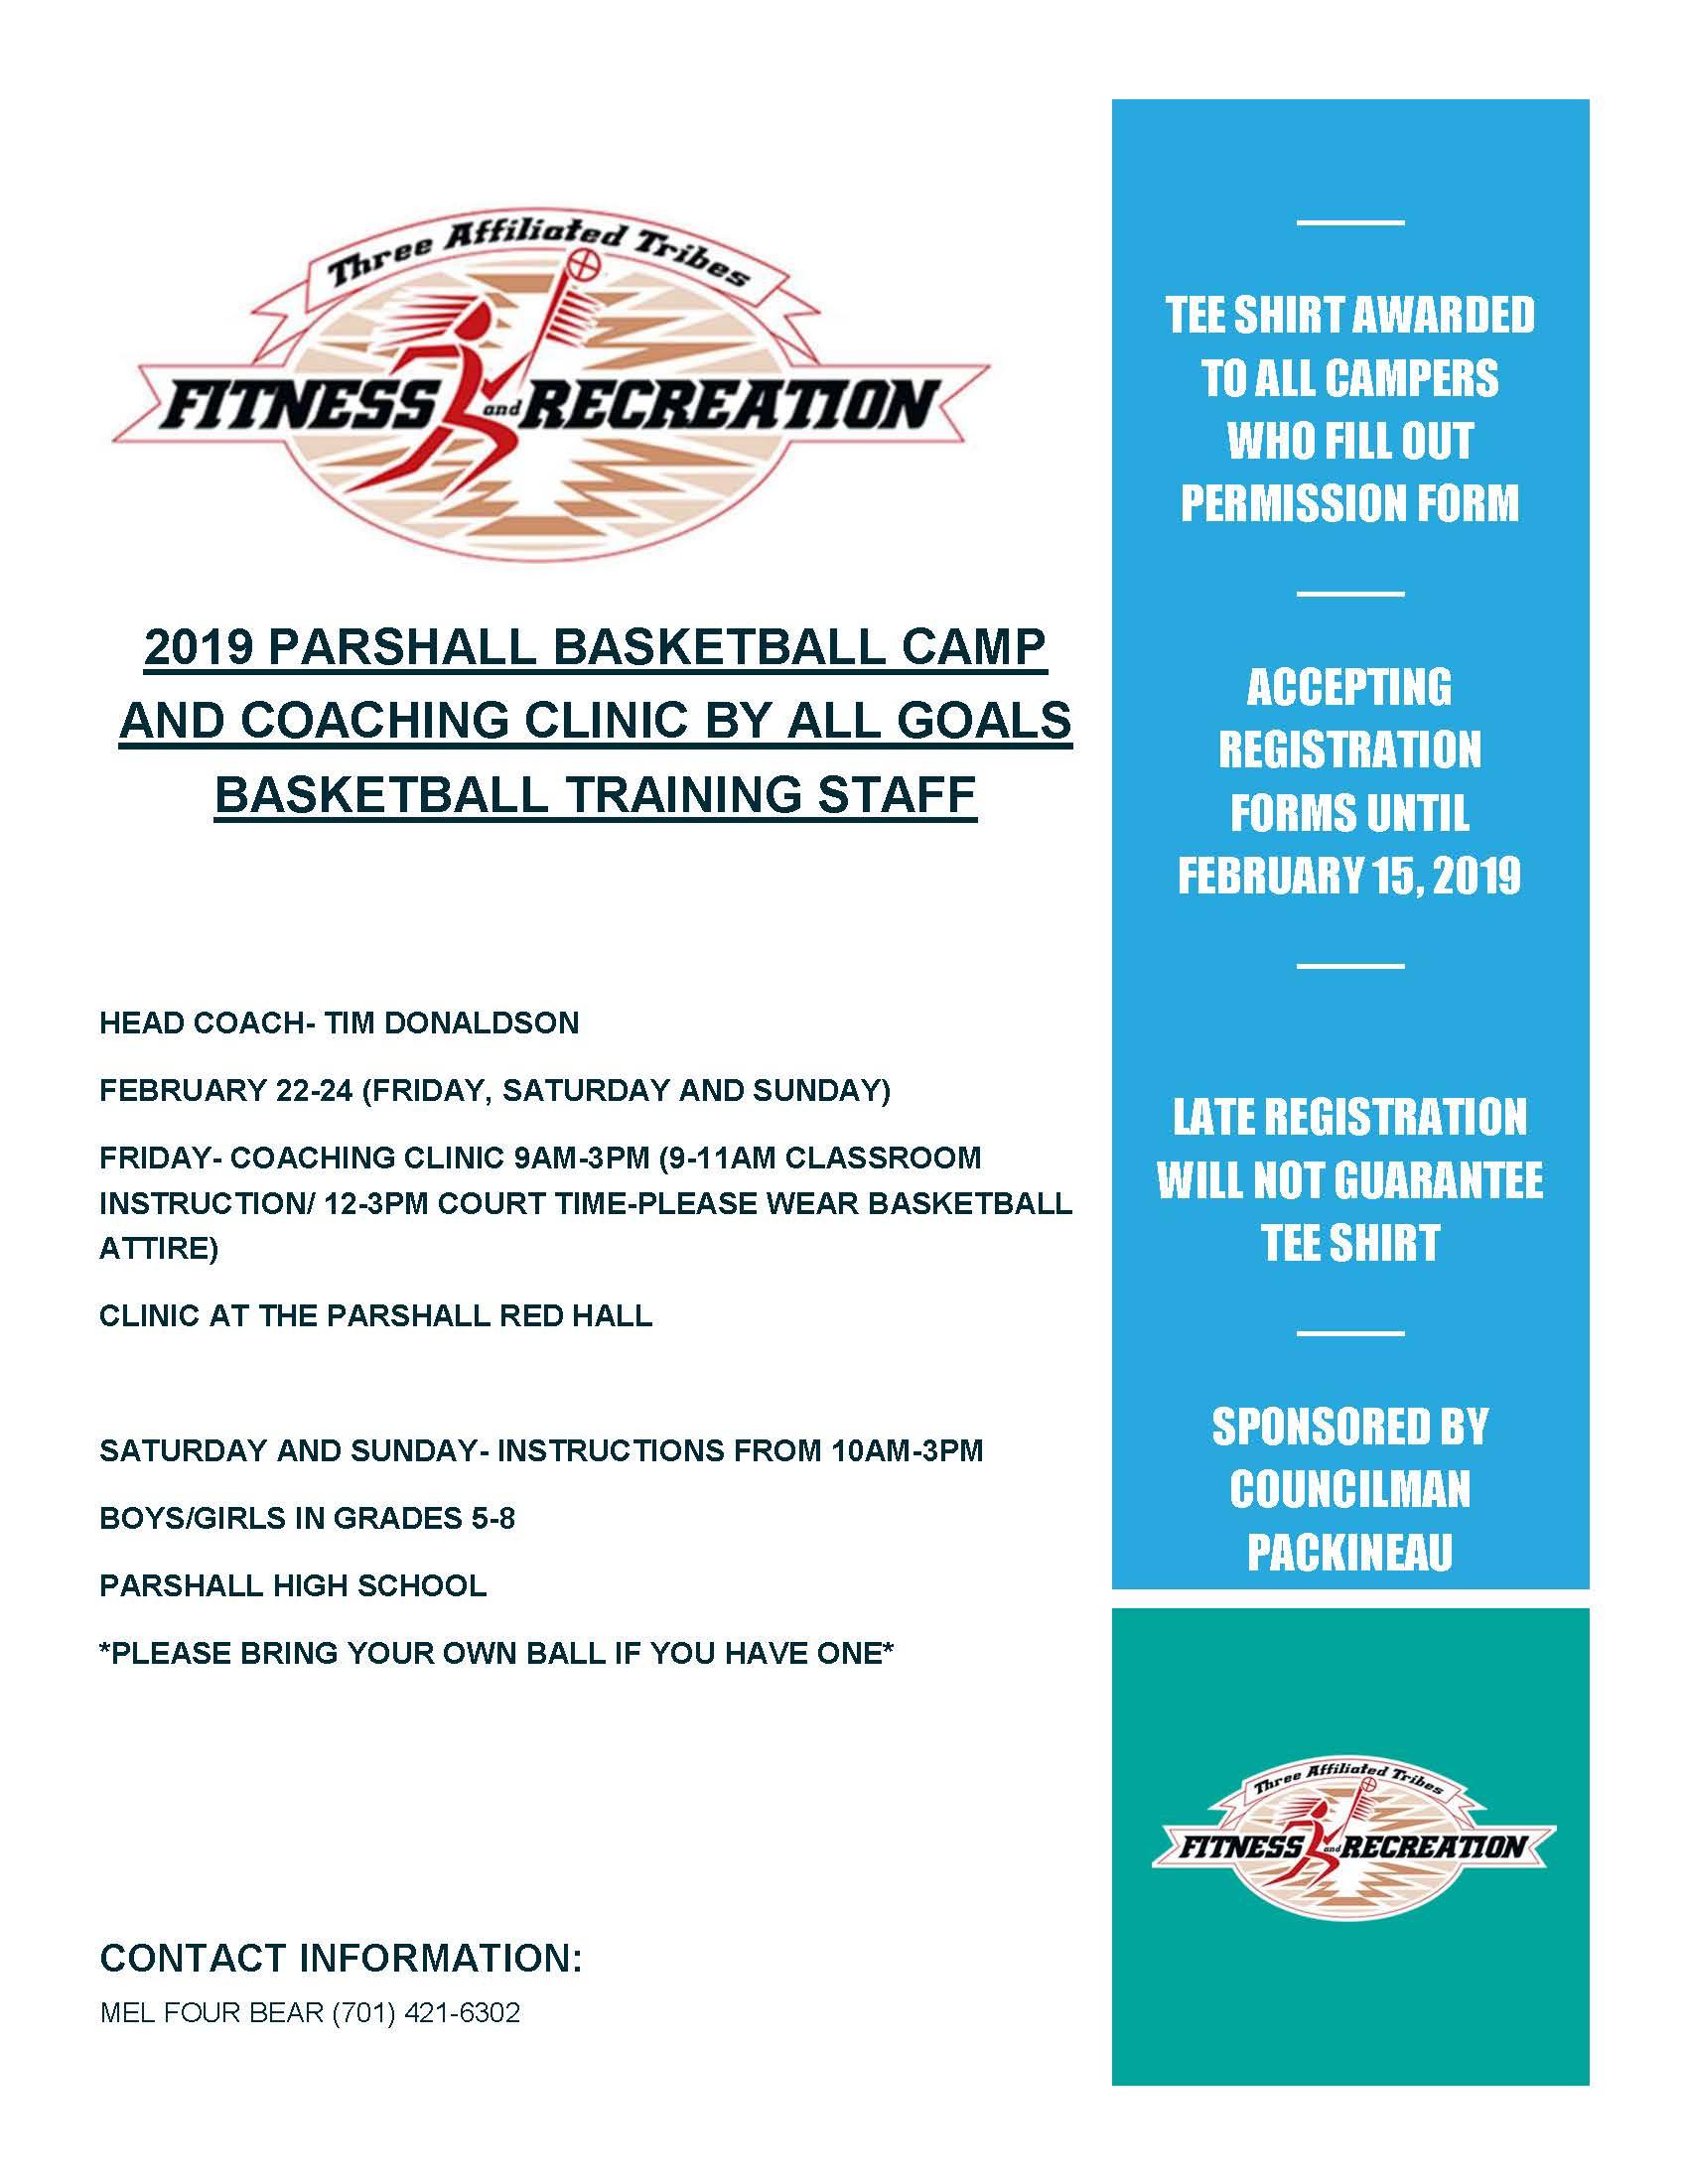 Parshall Basketball Camp Feb 2019.jpg